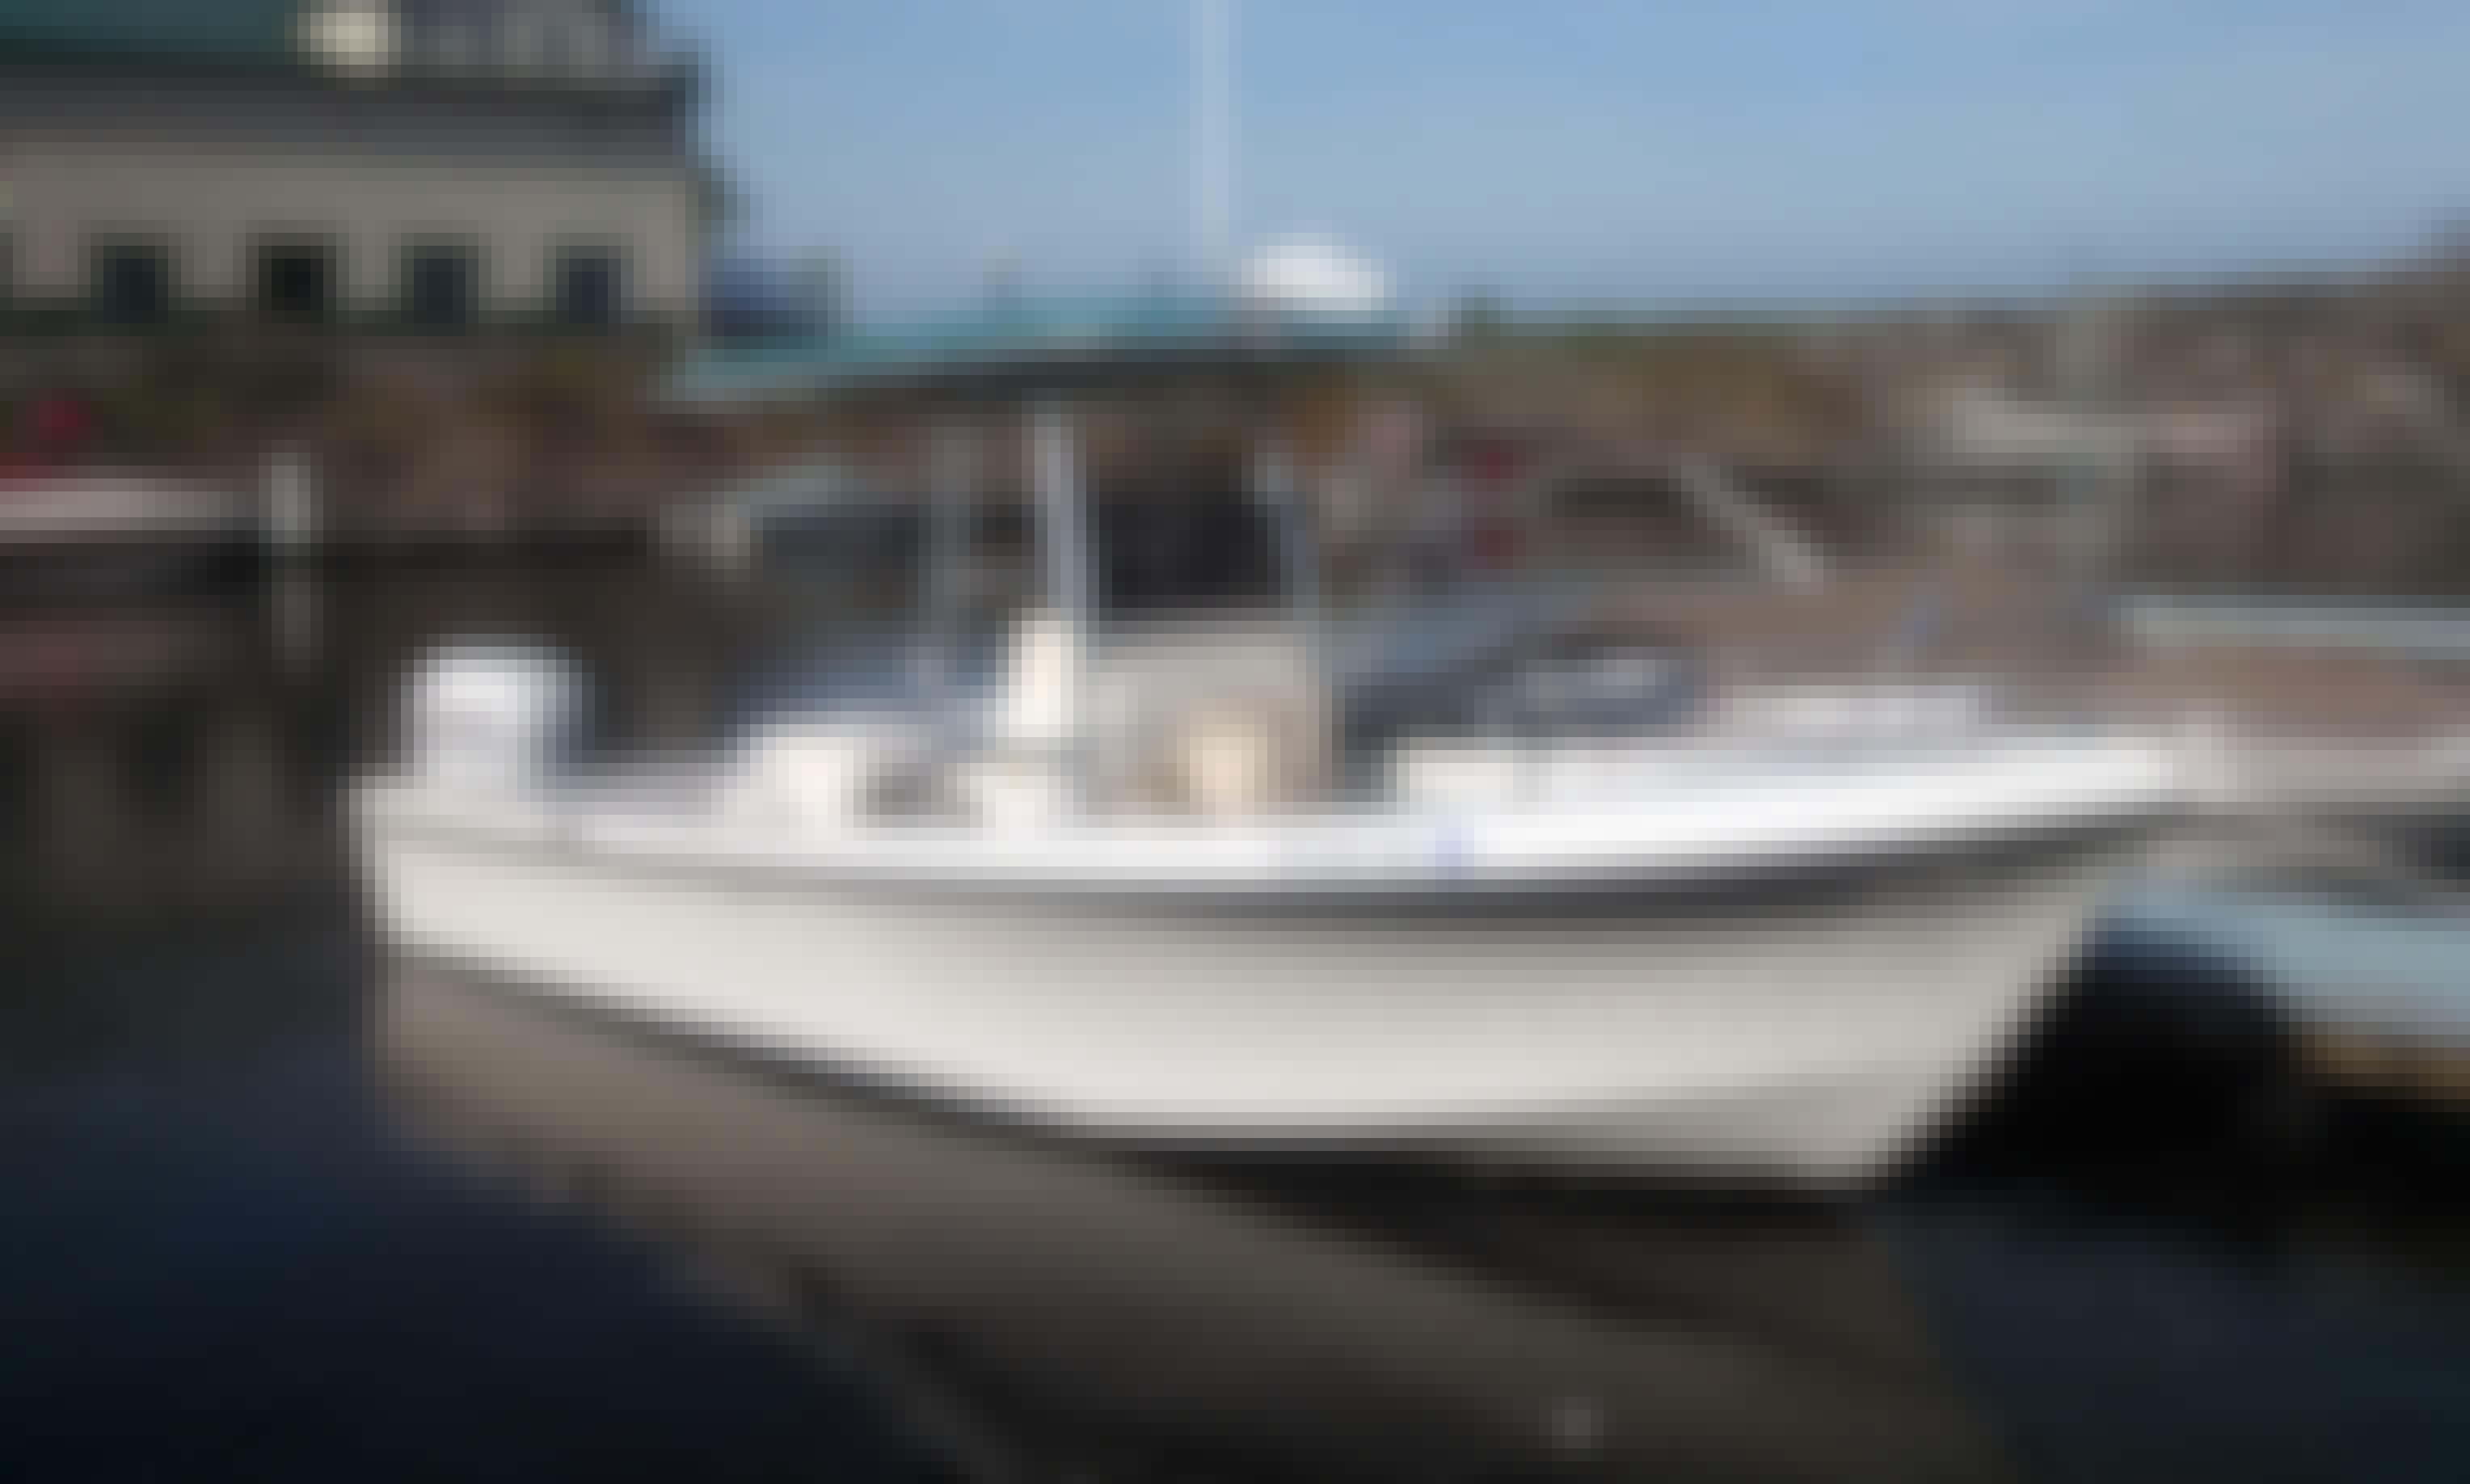 Book A Walleye Fishing In Oneida Lake, New York!